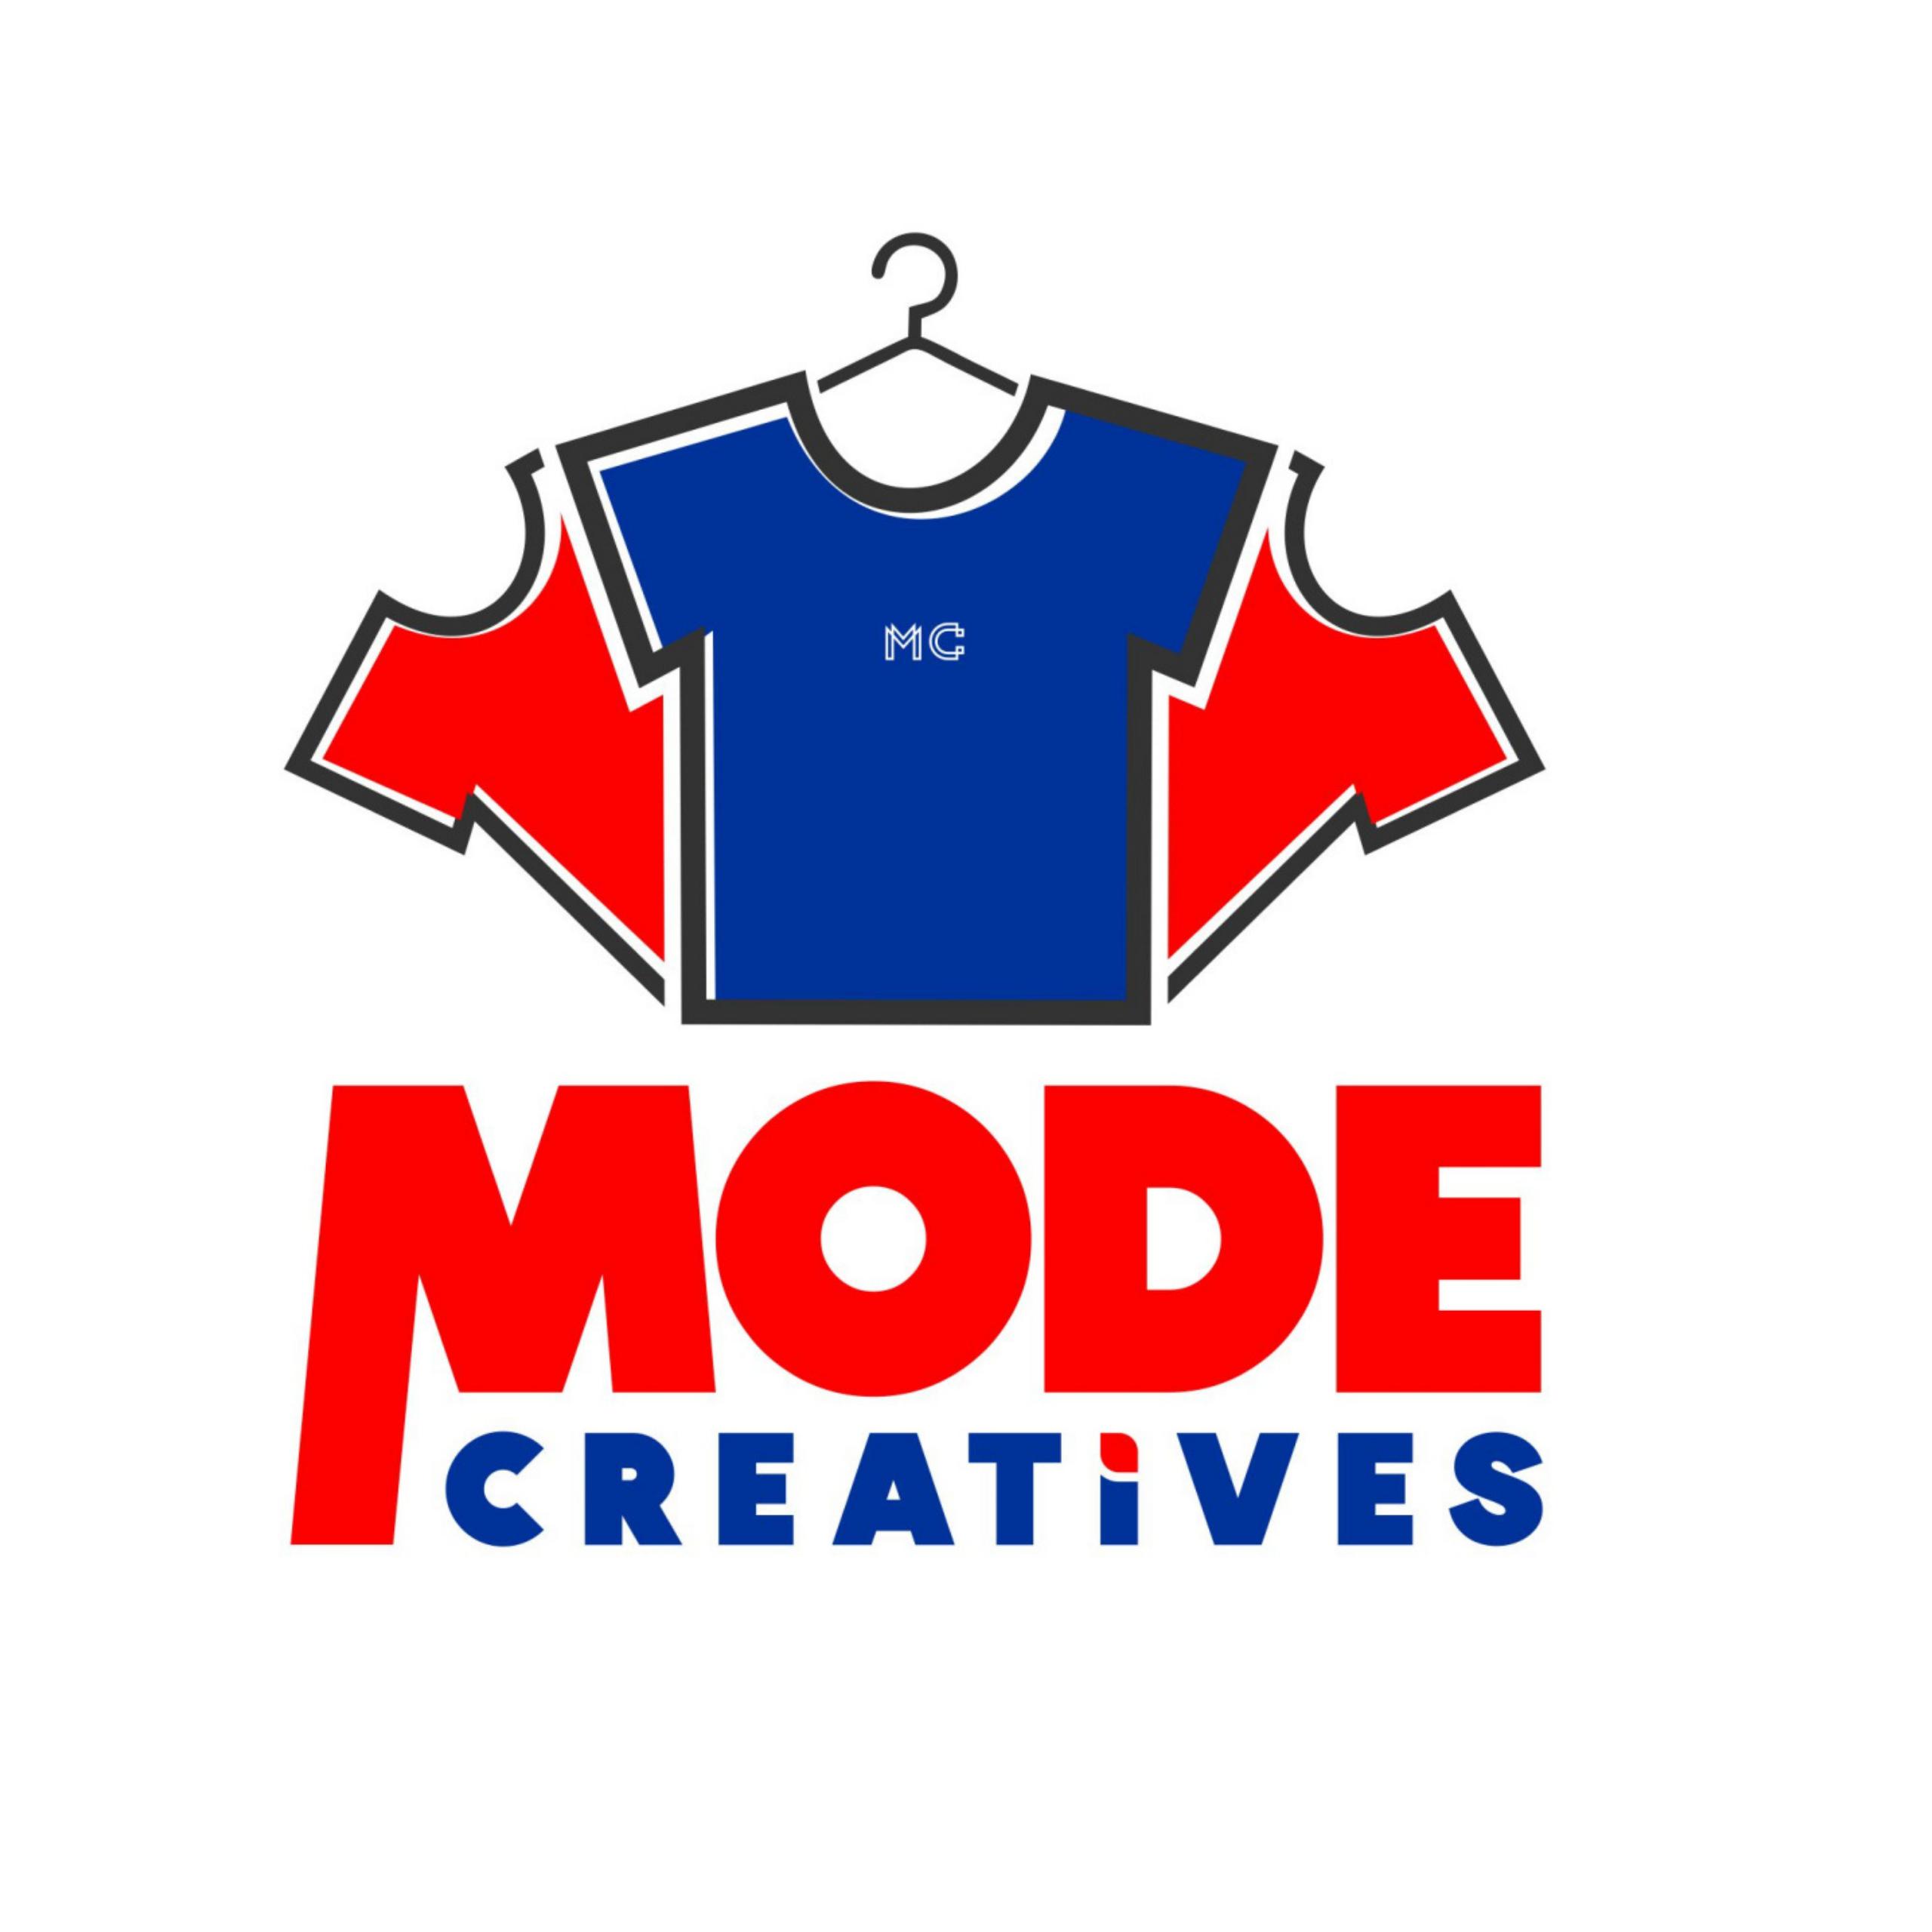 ModeCreatives Inspirational T-Shirts/Hoodies